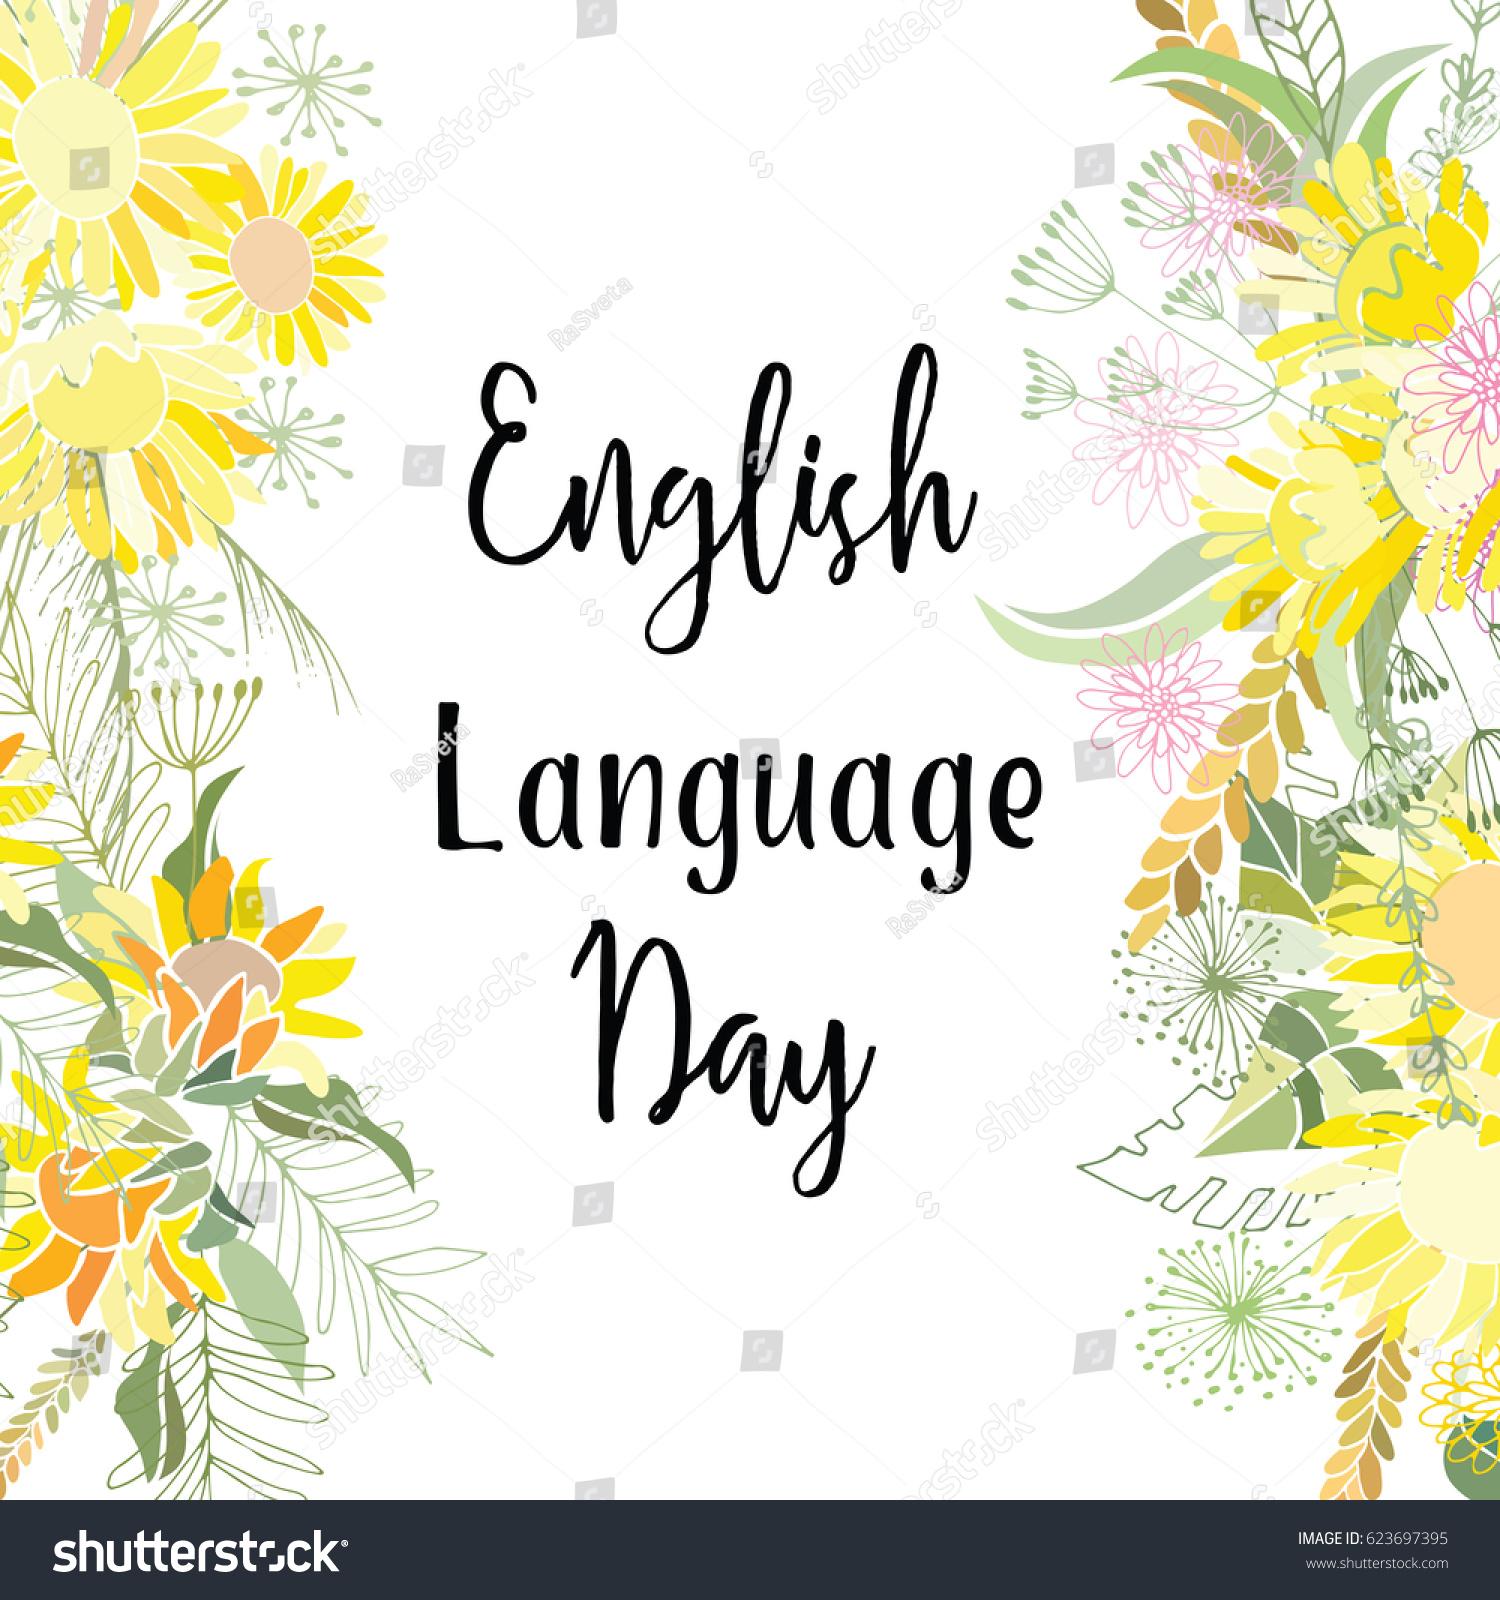 Greeting card english language day abstract stock vector royalty greeting card of the english language day abstract background m4hsunfo